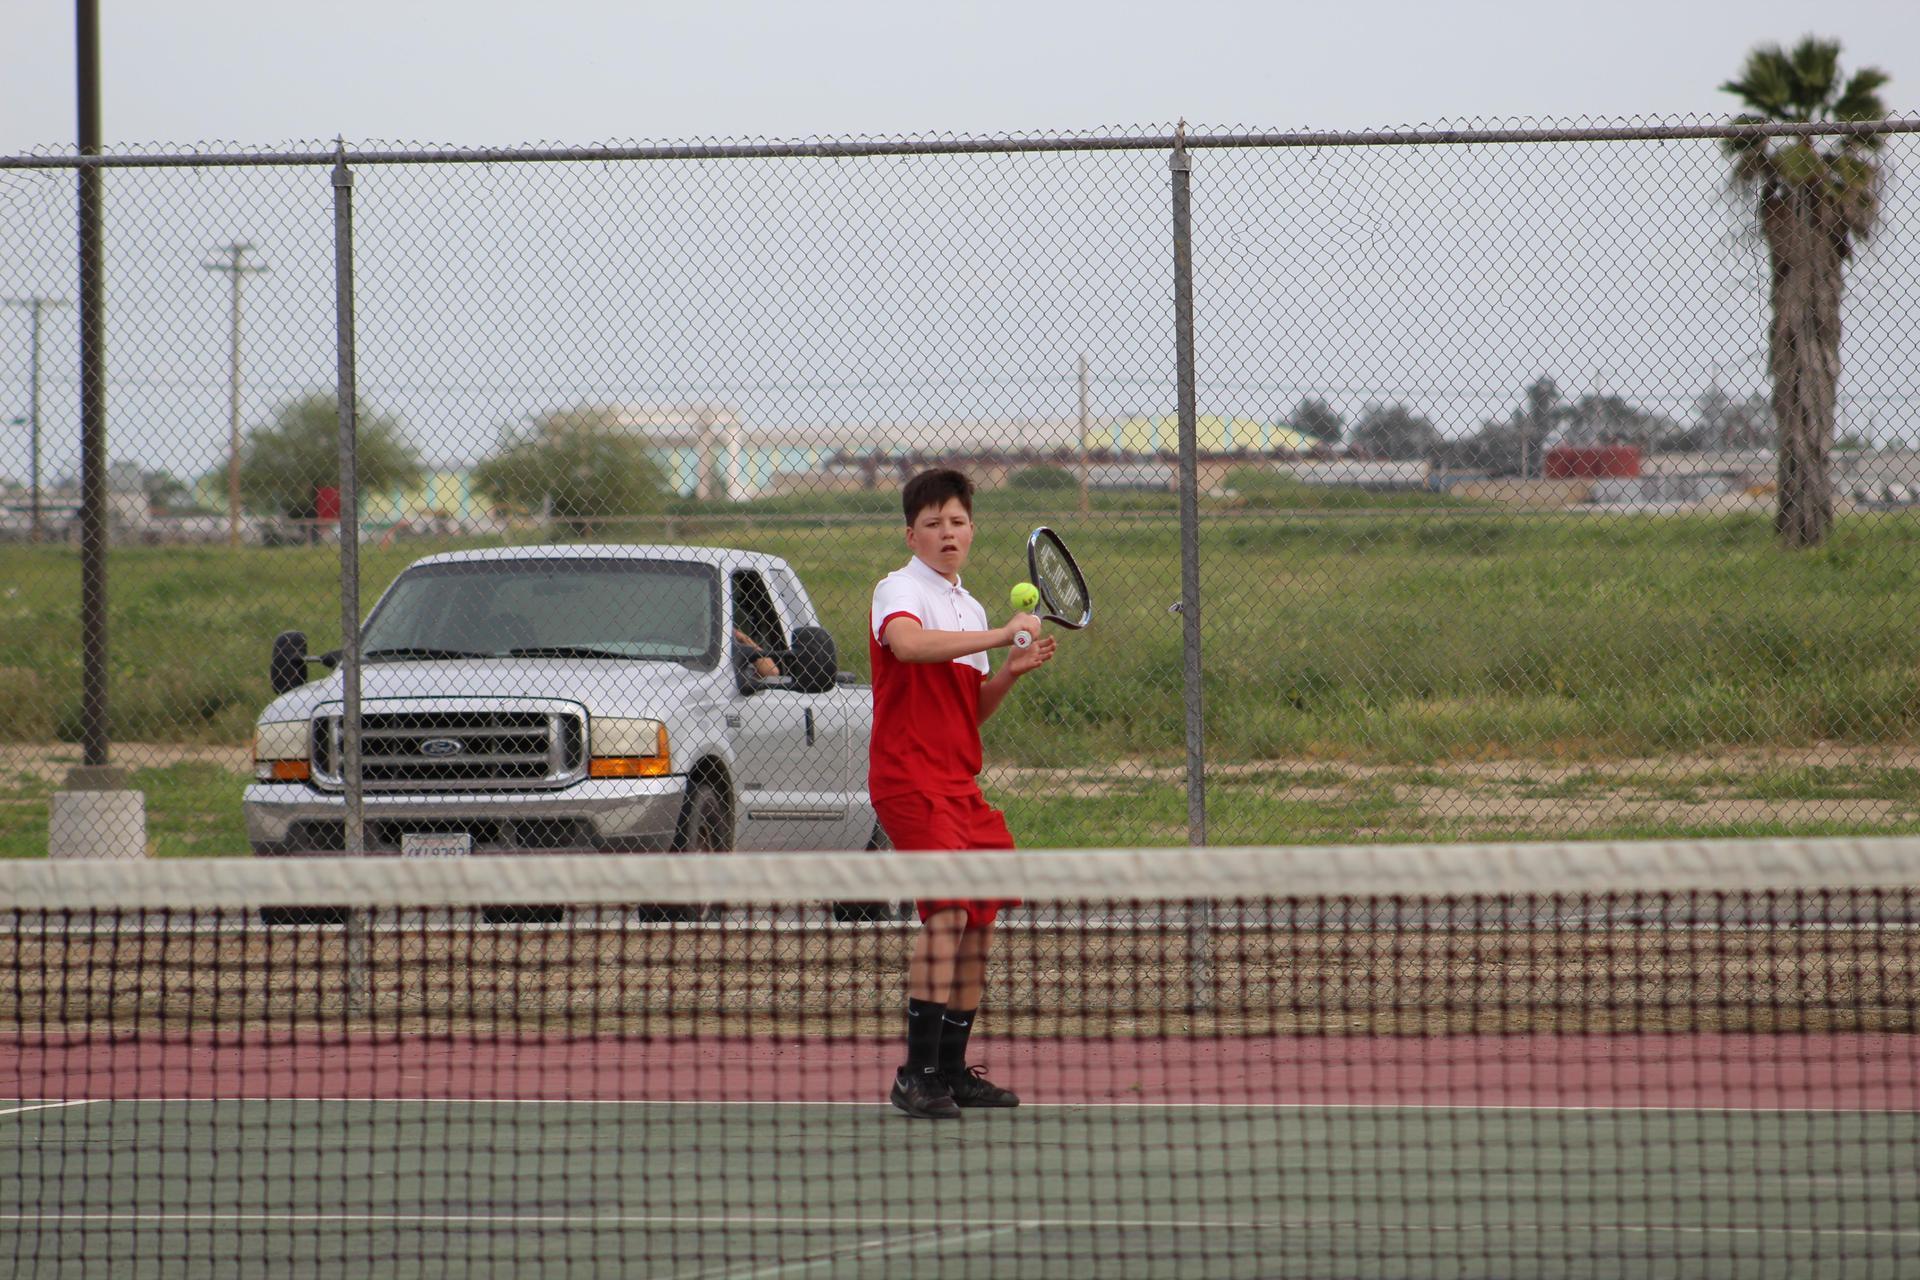 Boys playing tennis against Washington Union